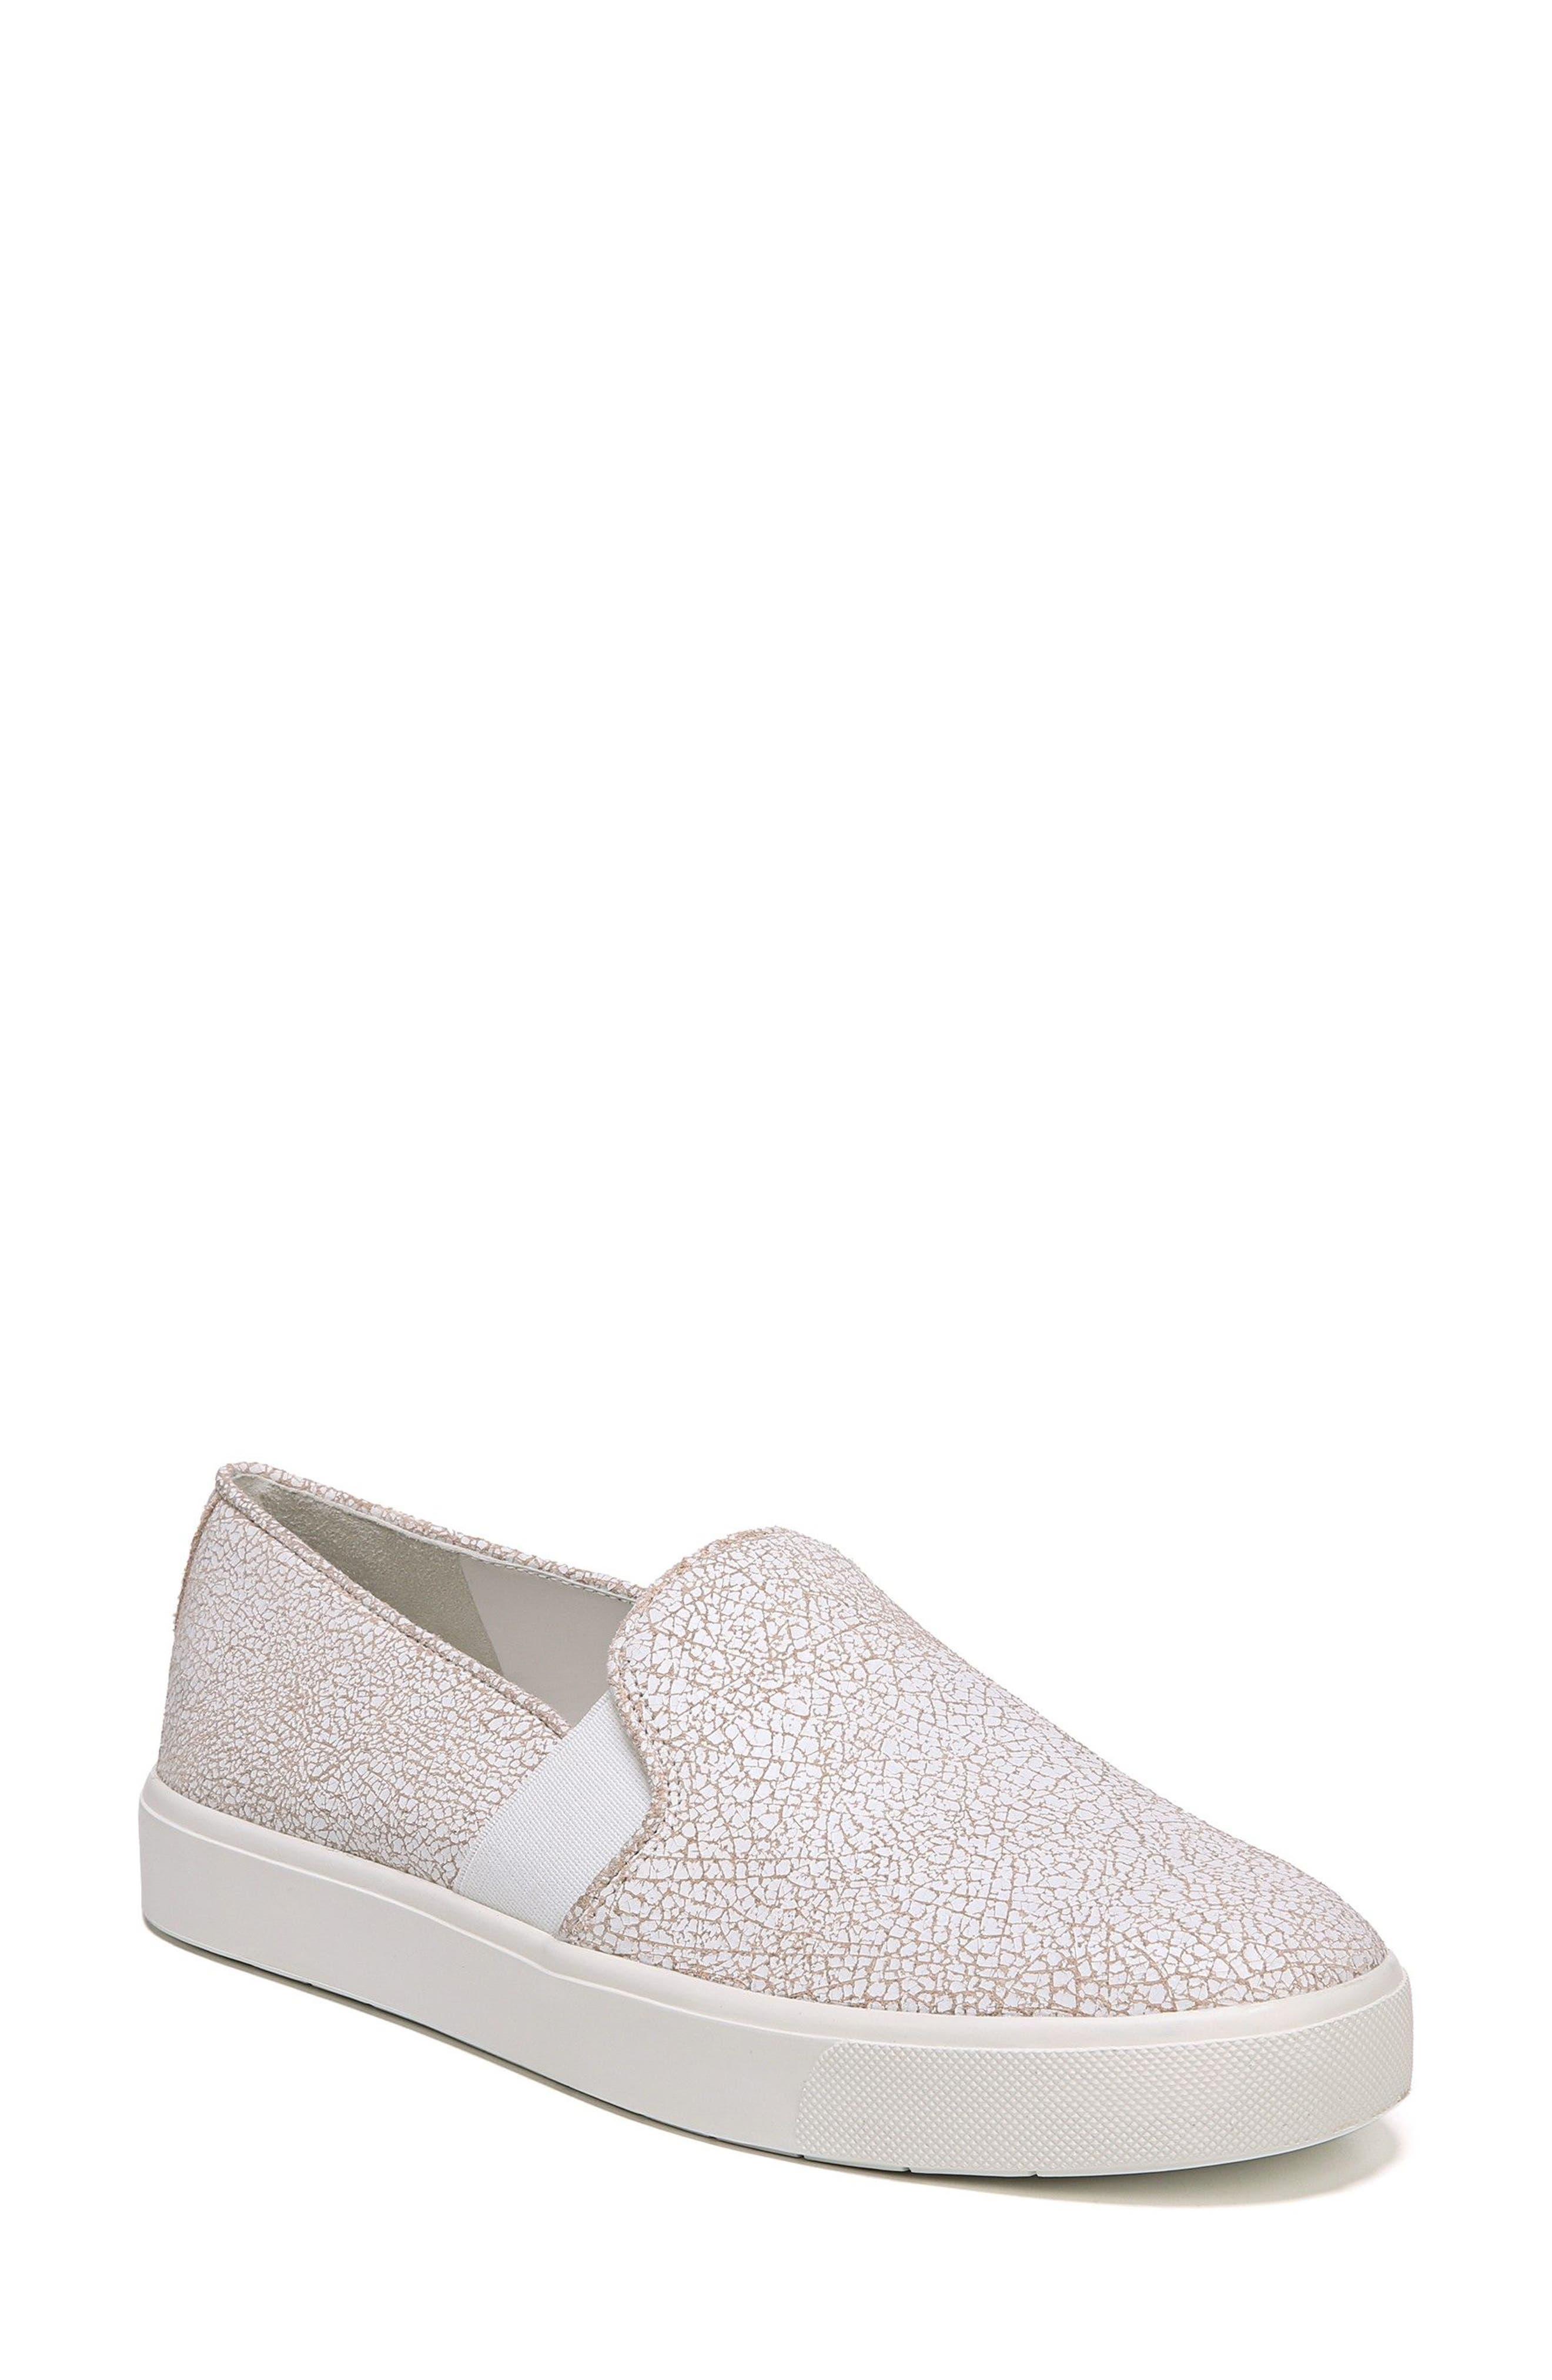 'Blair 12' Leather Slip-On Sneaker,                         Main,                         color, White